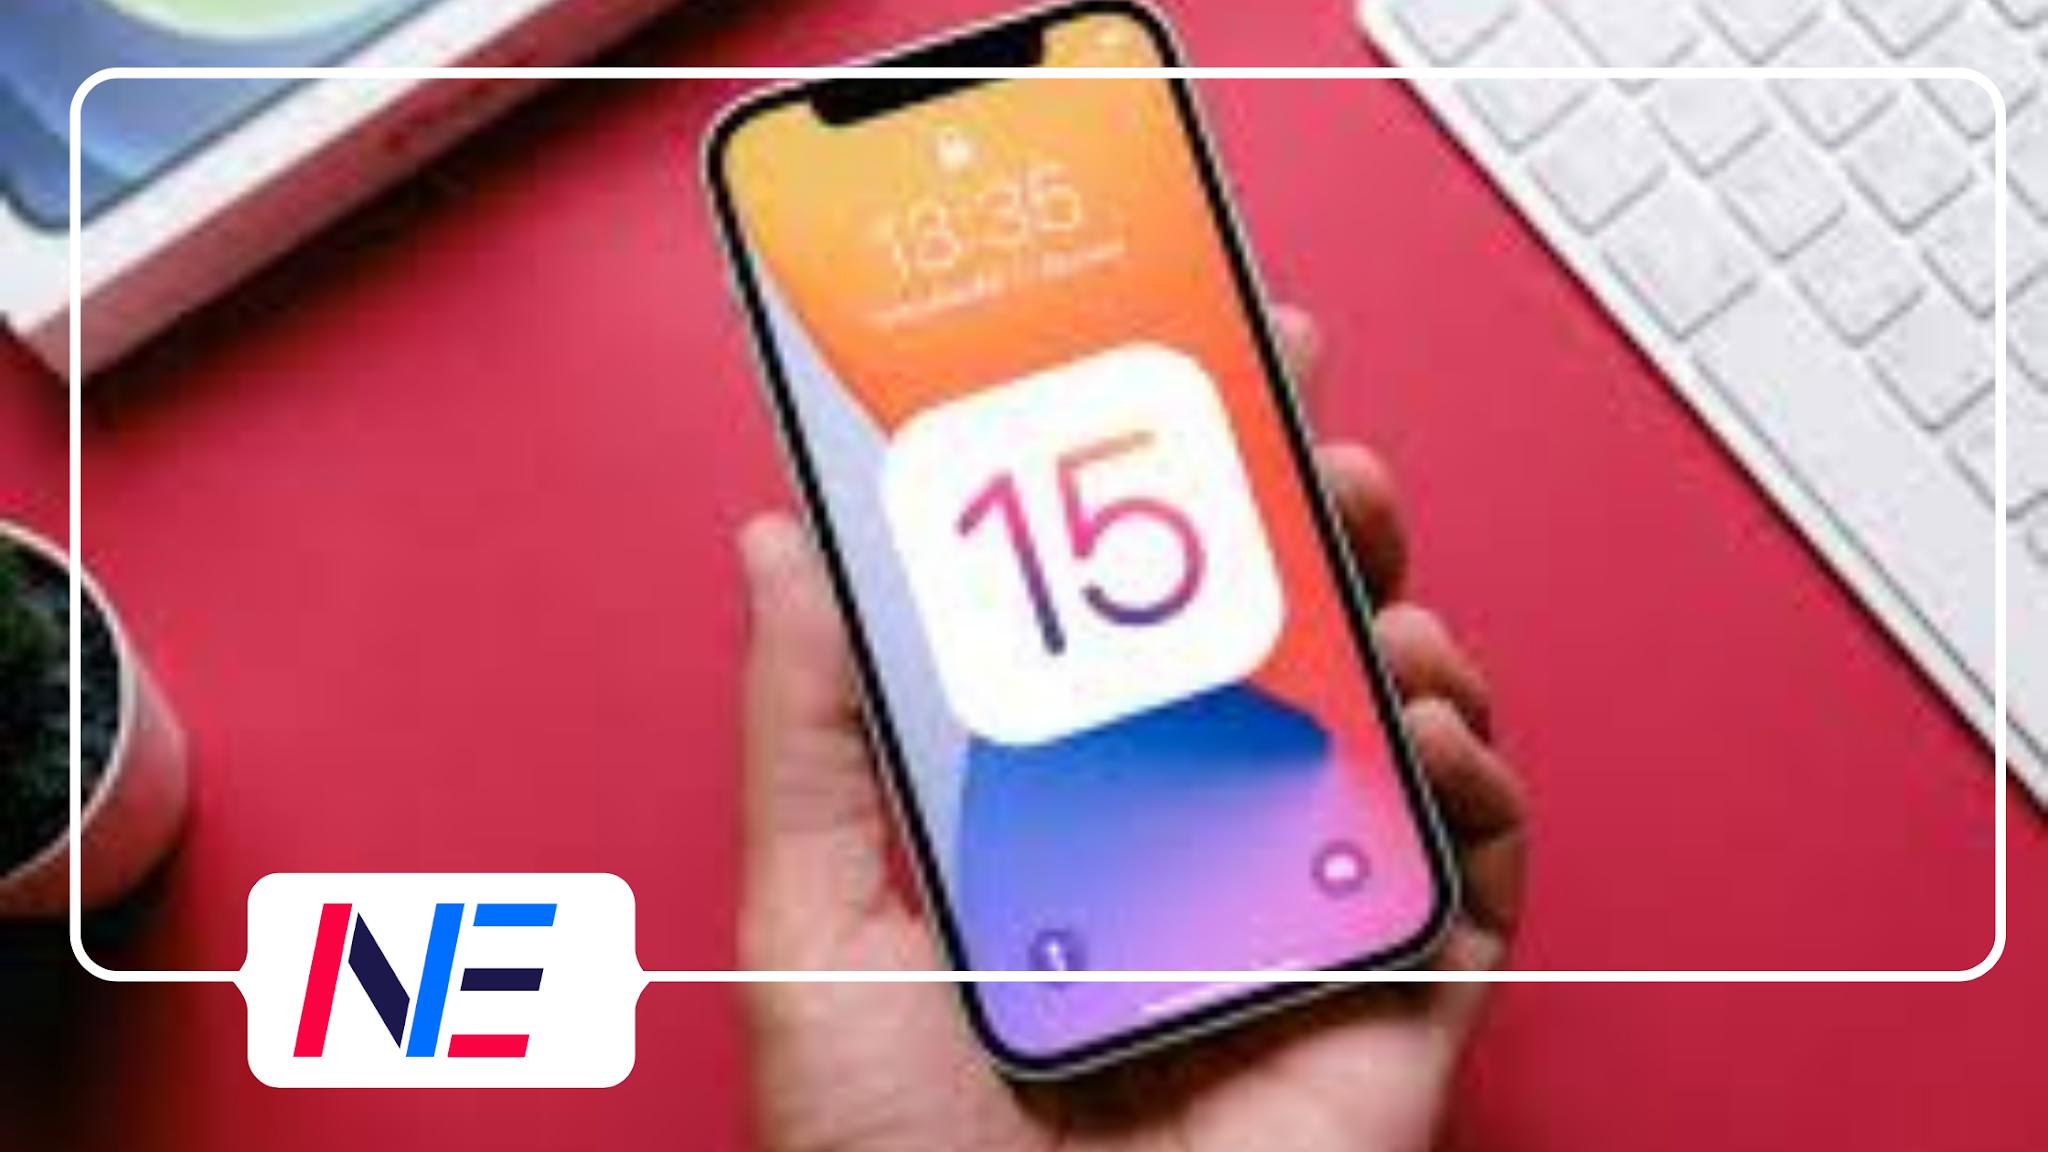 Apple - Iphone .. تعرف علي مميزات تحديثات 15 iOS الجديدة من شركة أبل في هواتف آيفون | نظام التحديث الجديد لشركة Apple في تليفون آيفون